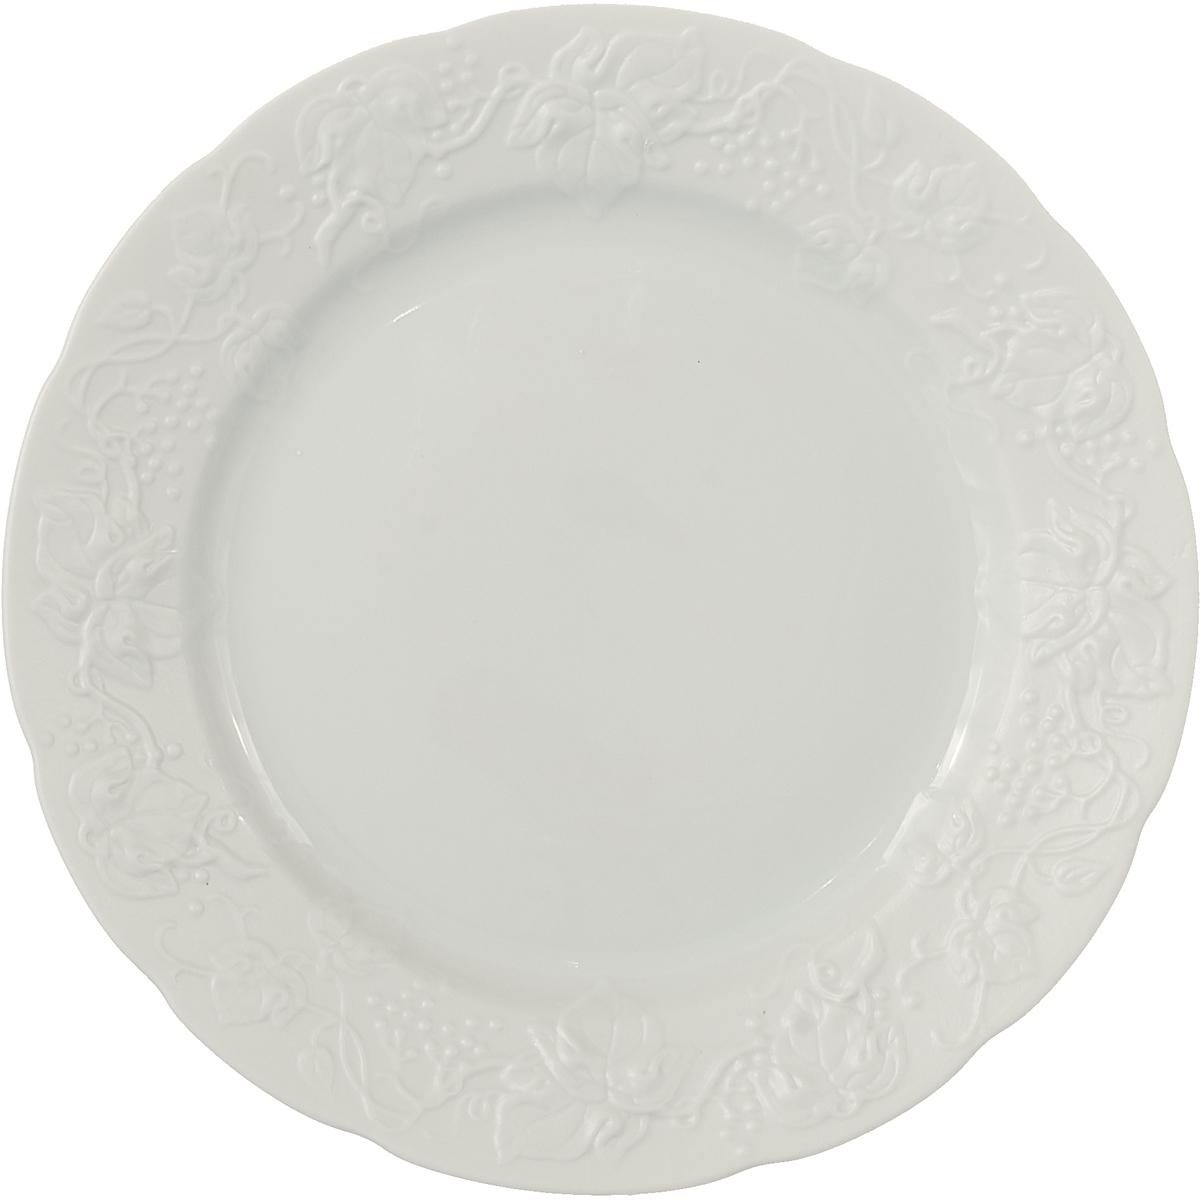 Тарелка La Rose des Sables Blanc, 3100121, белый, диаметр 21 см салатник круглый 13 см la rose des sables mimosa didon or 533913 1645